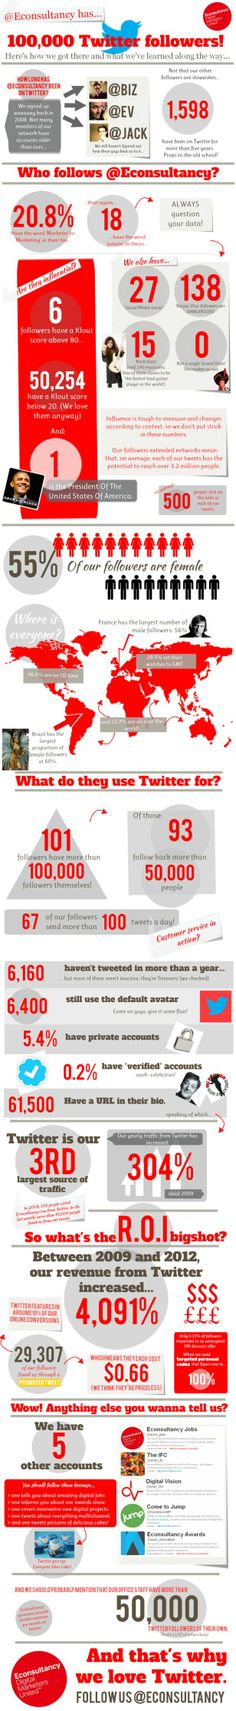 How Econsultancy got 100,000 Twitter followers